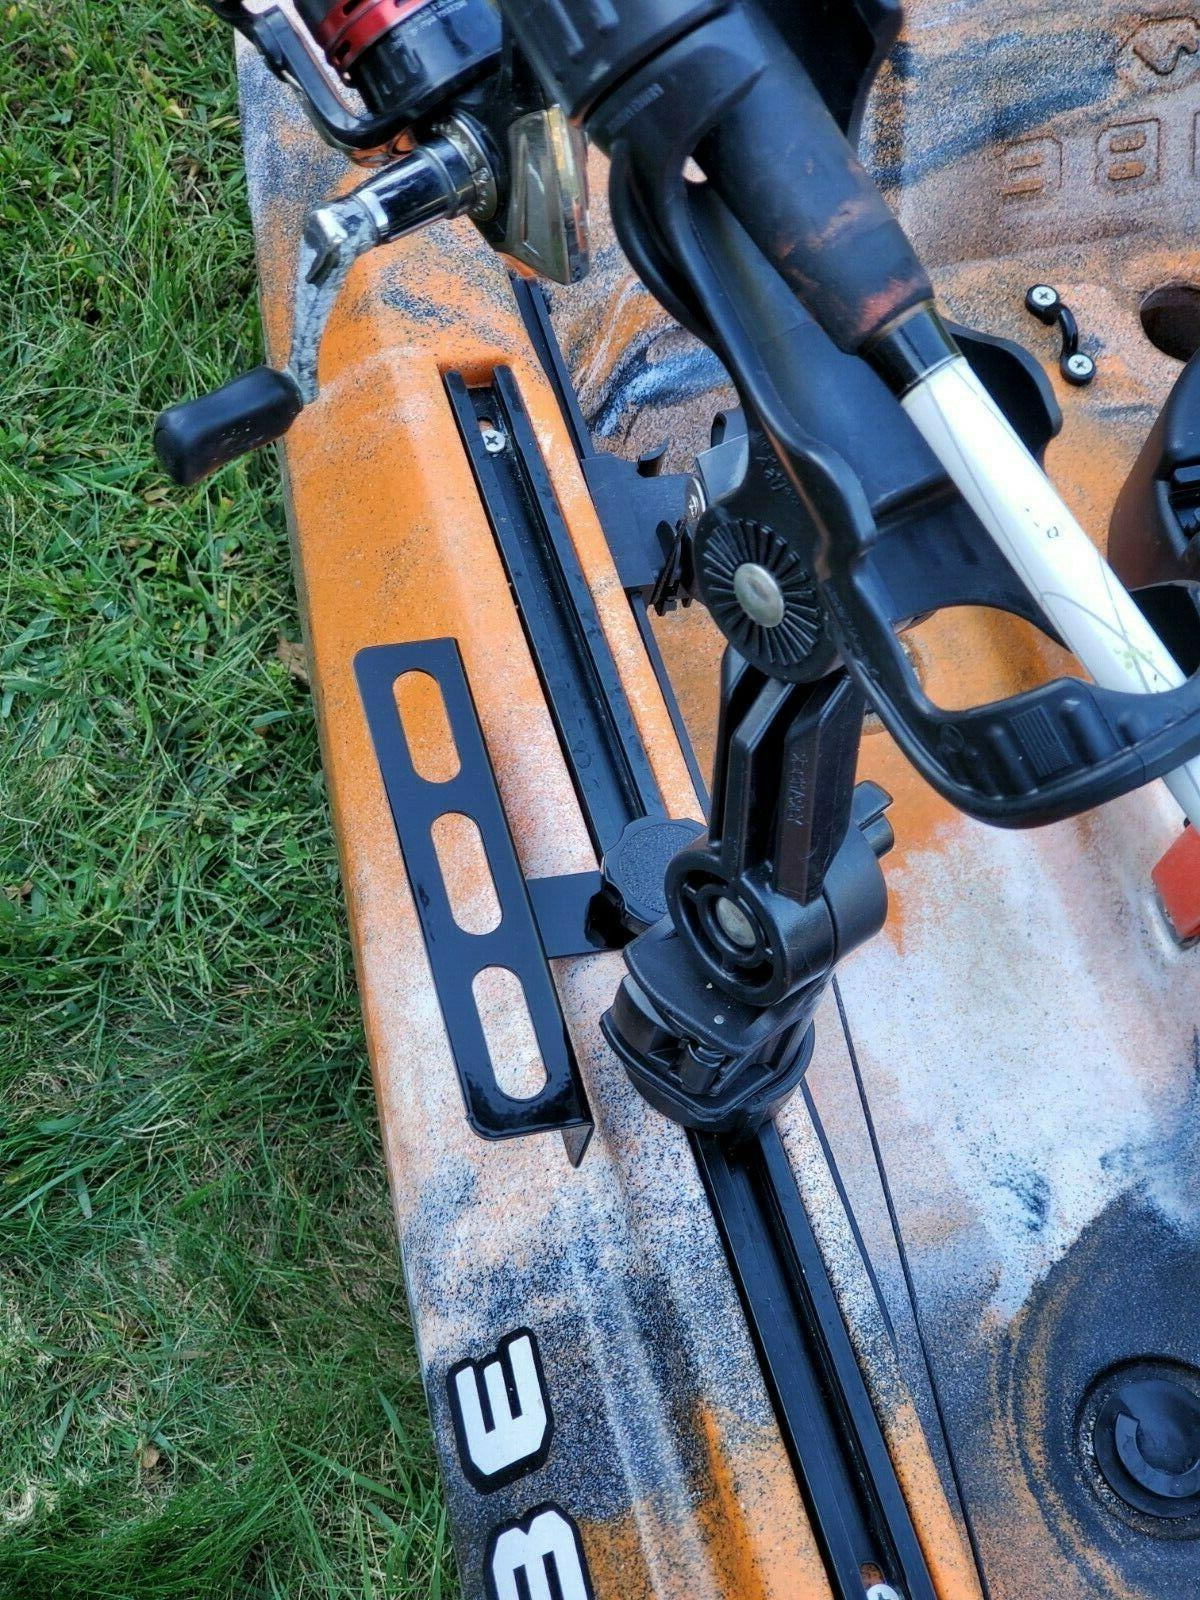 Kayak Track Tool Rod holder, Accessories